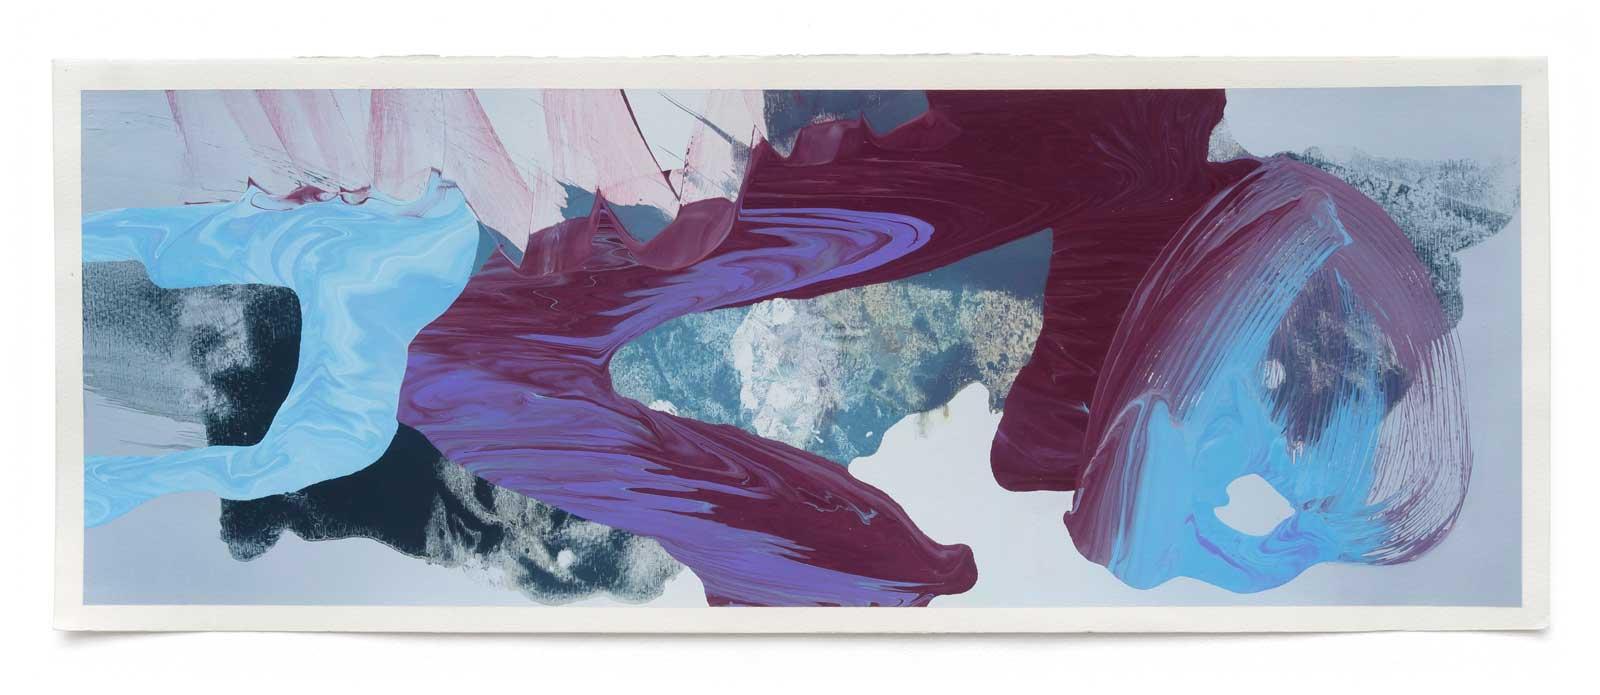 Disruptions-1-oil-on-paper-25.4 cm x 71.12 cm.